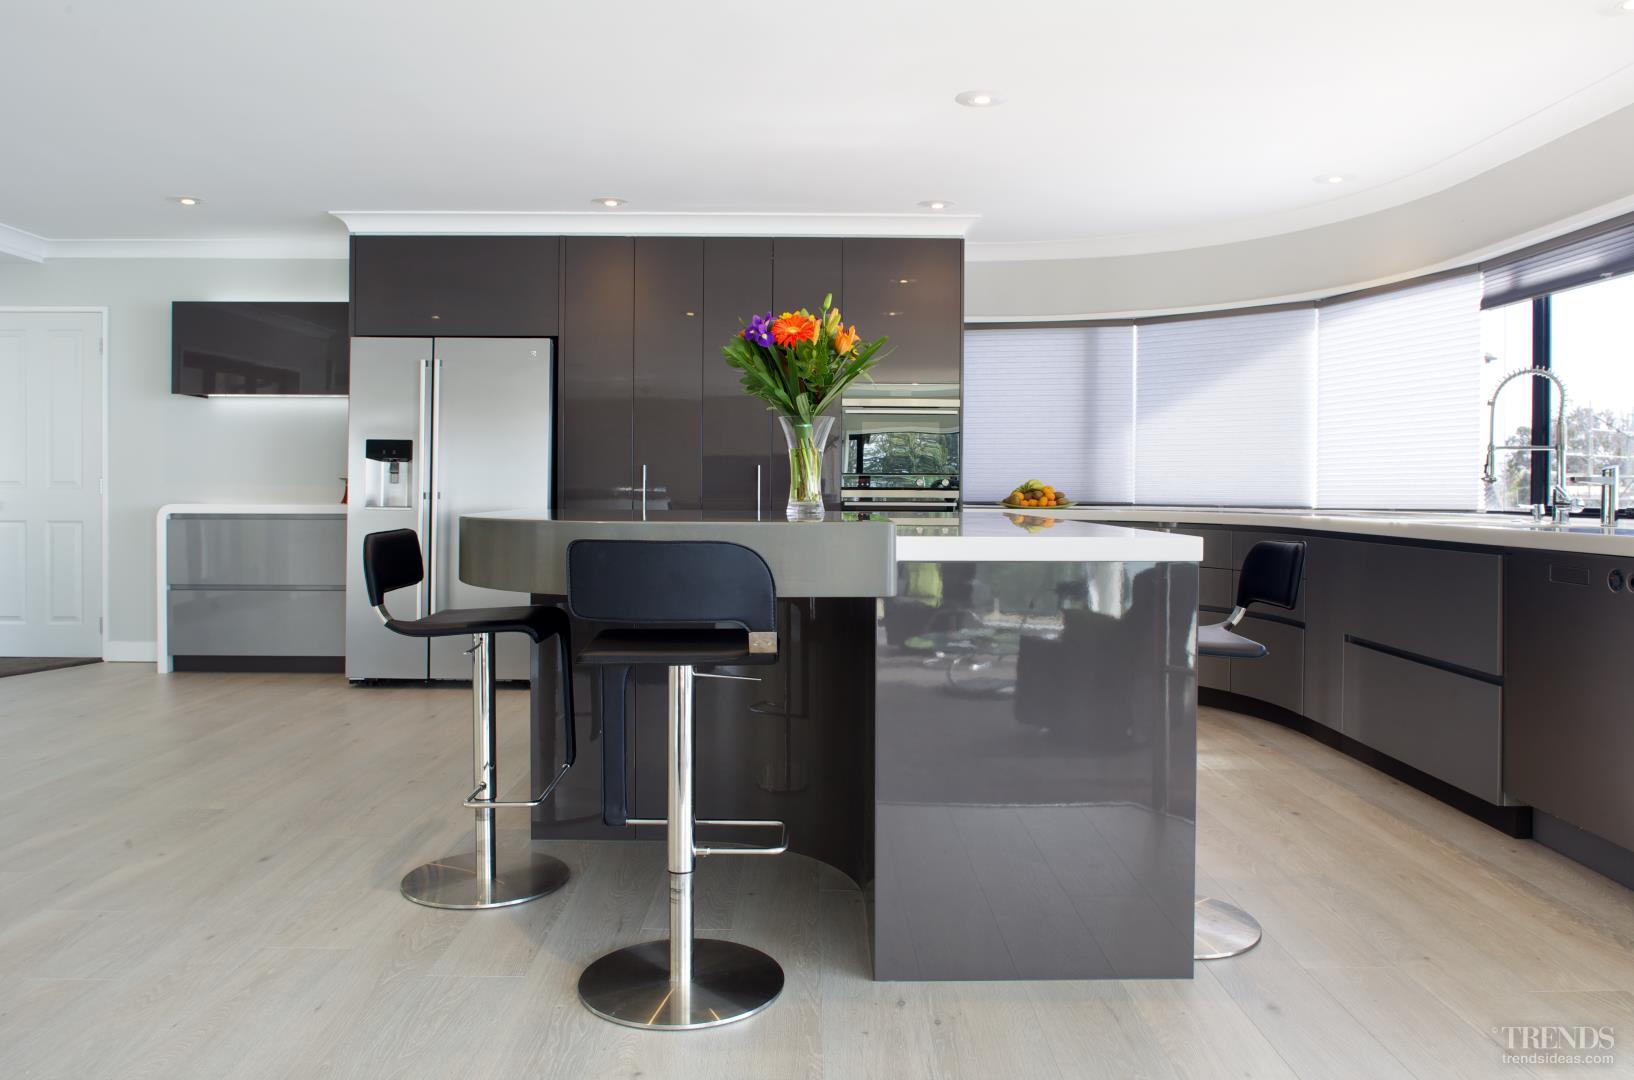 High gloss kitchens mastercraft kitchens - New Custom Designed Kitchen By Mastercraft Kitchens With Metallic Lacquered Cabinets